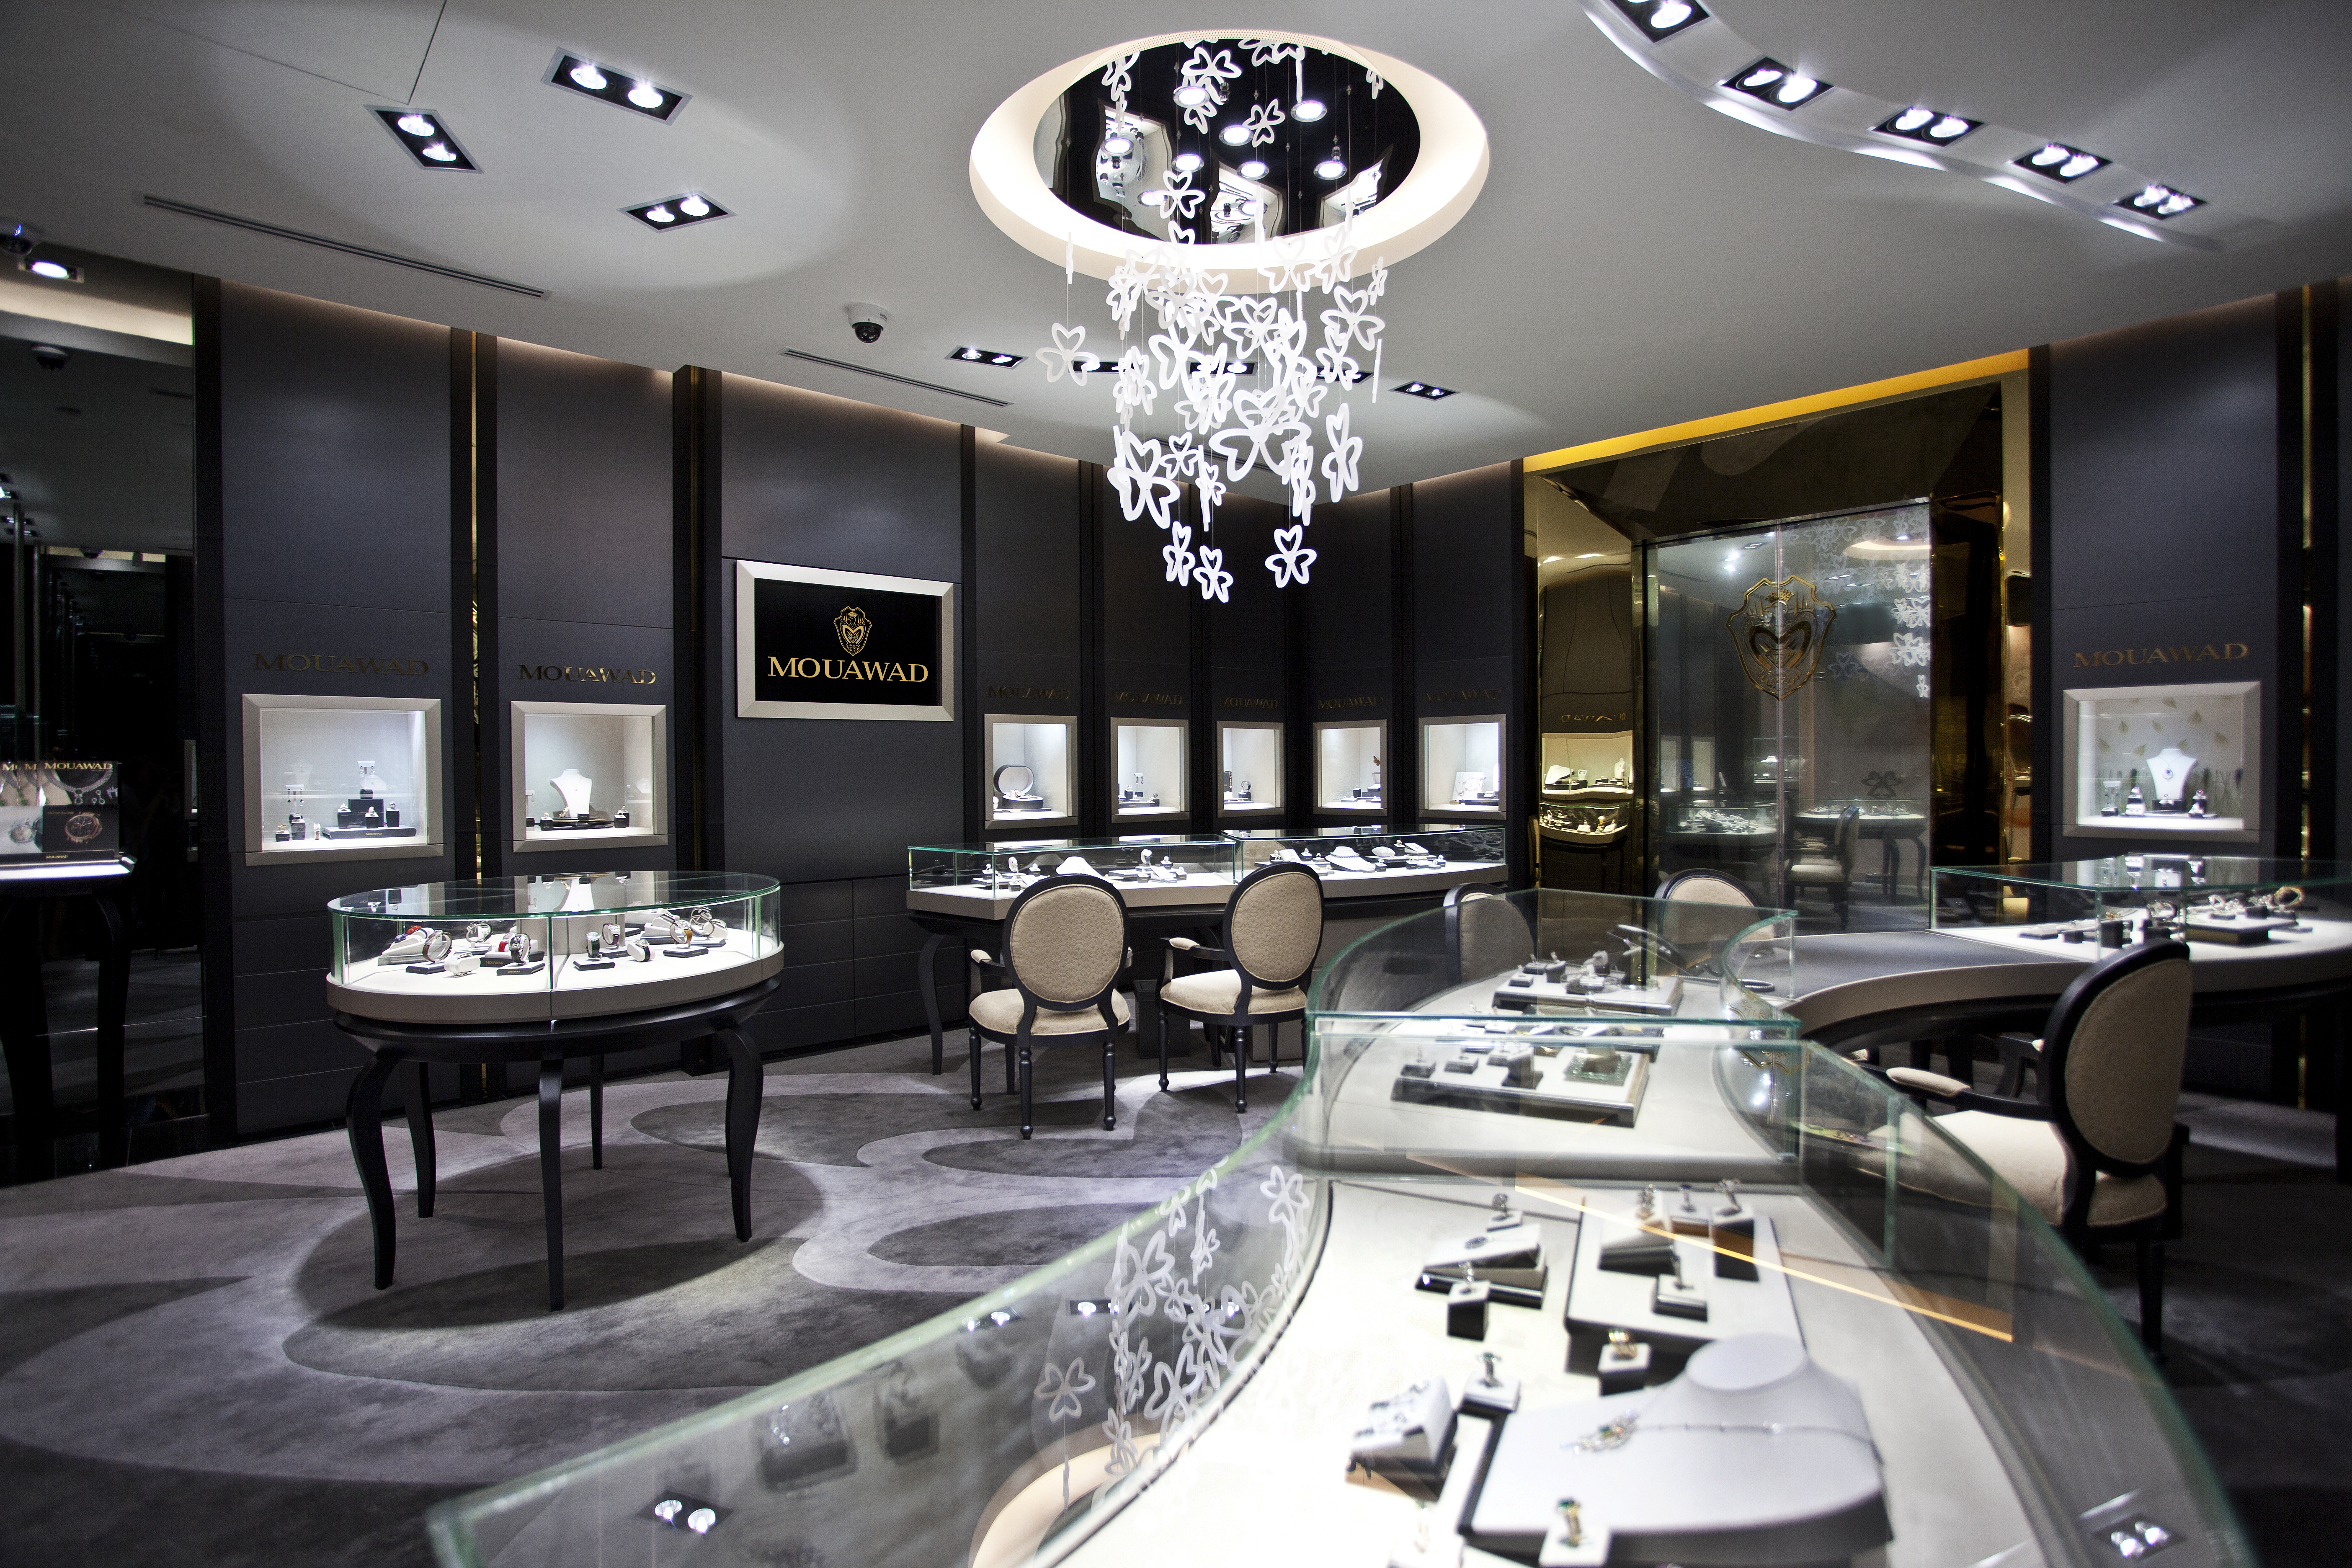 Mouawad's Jewellers - Singapore